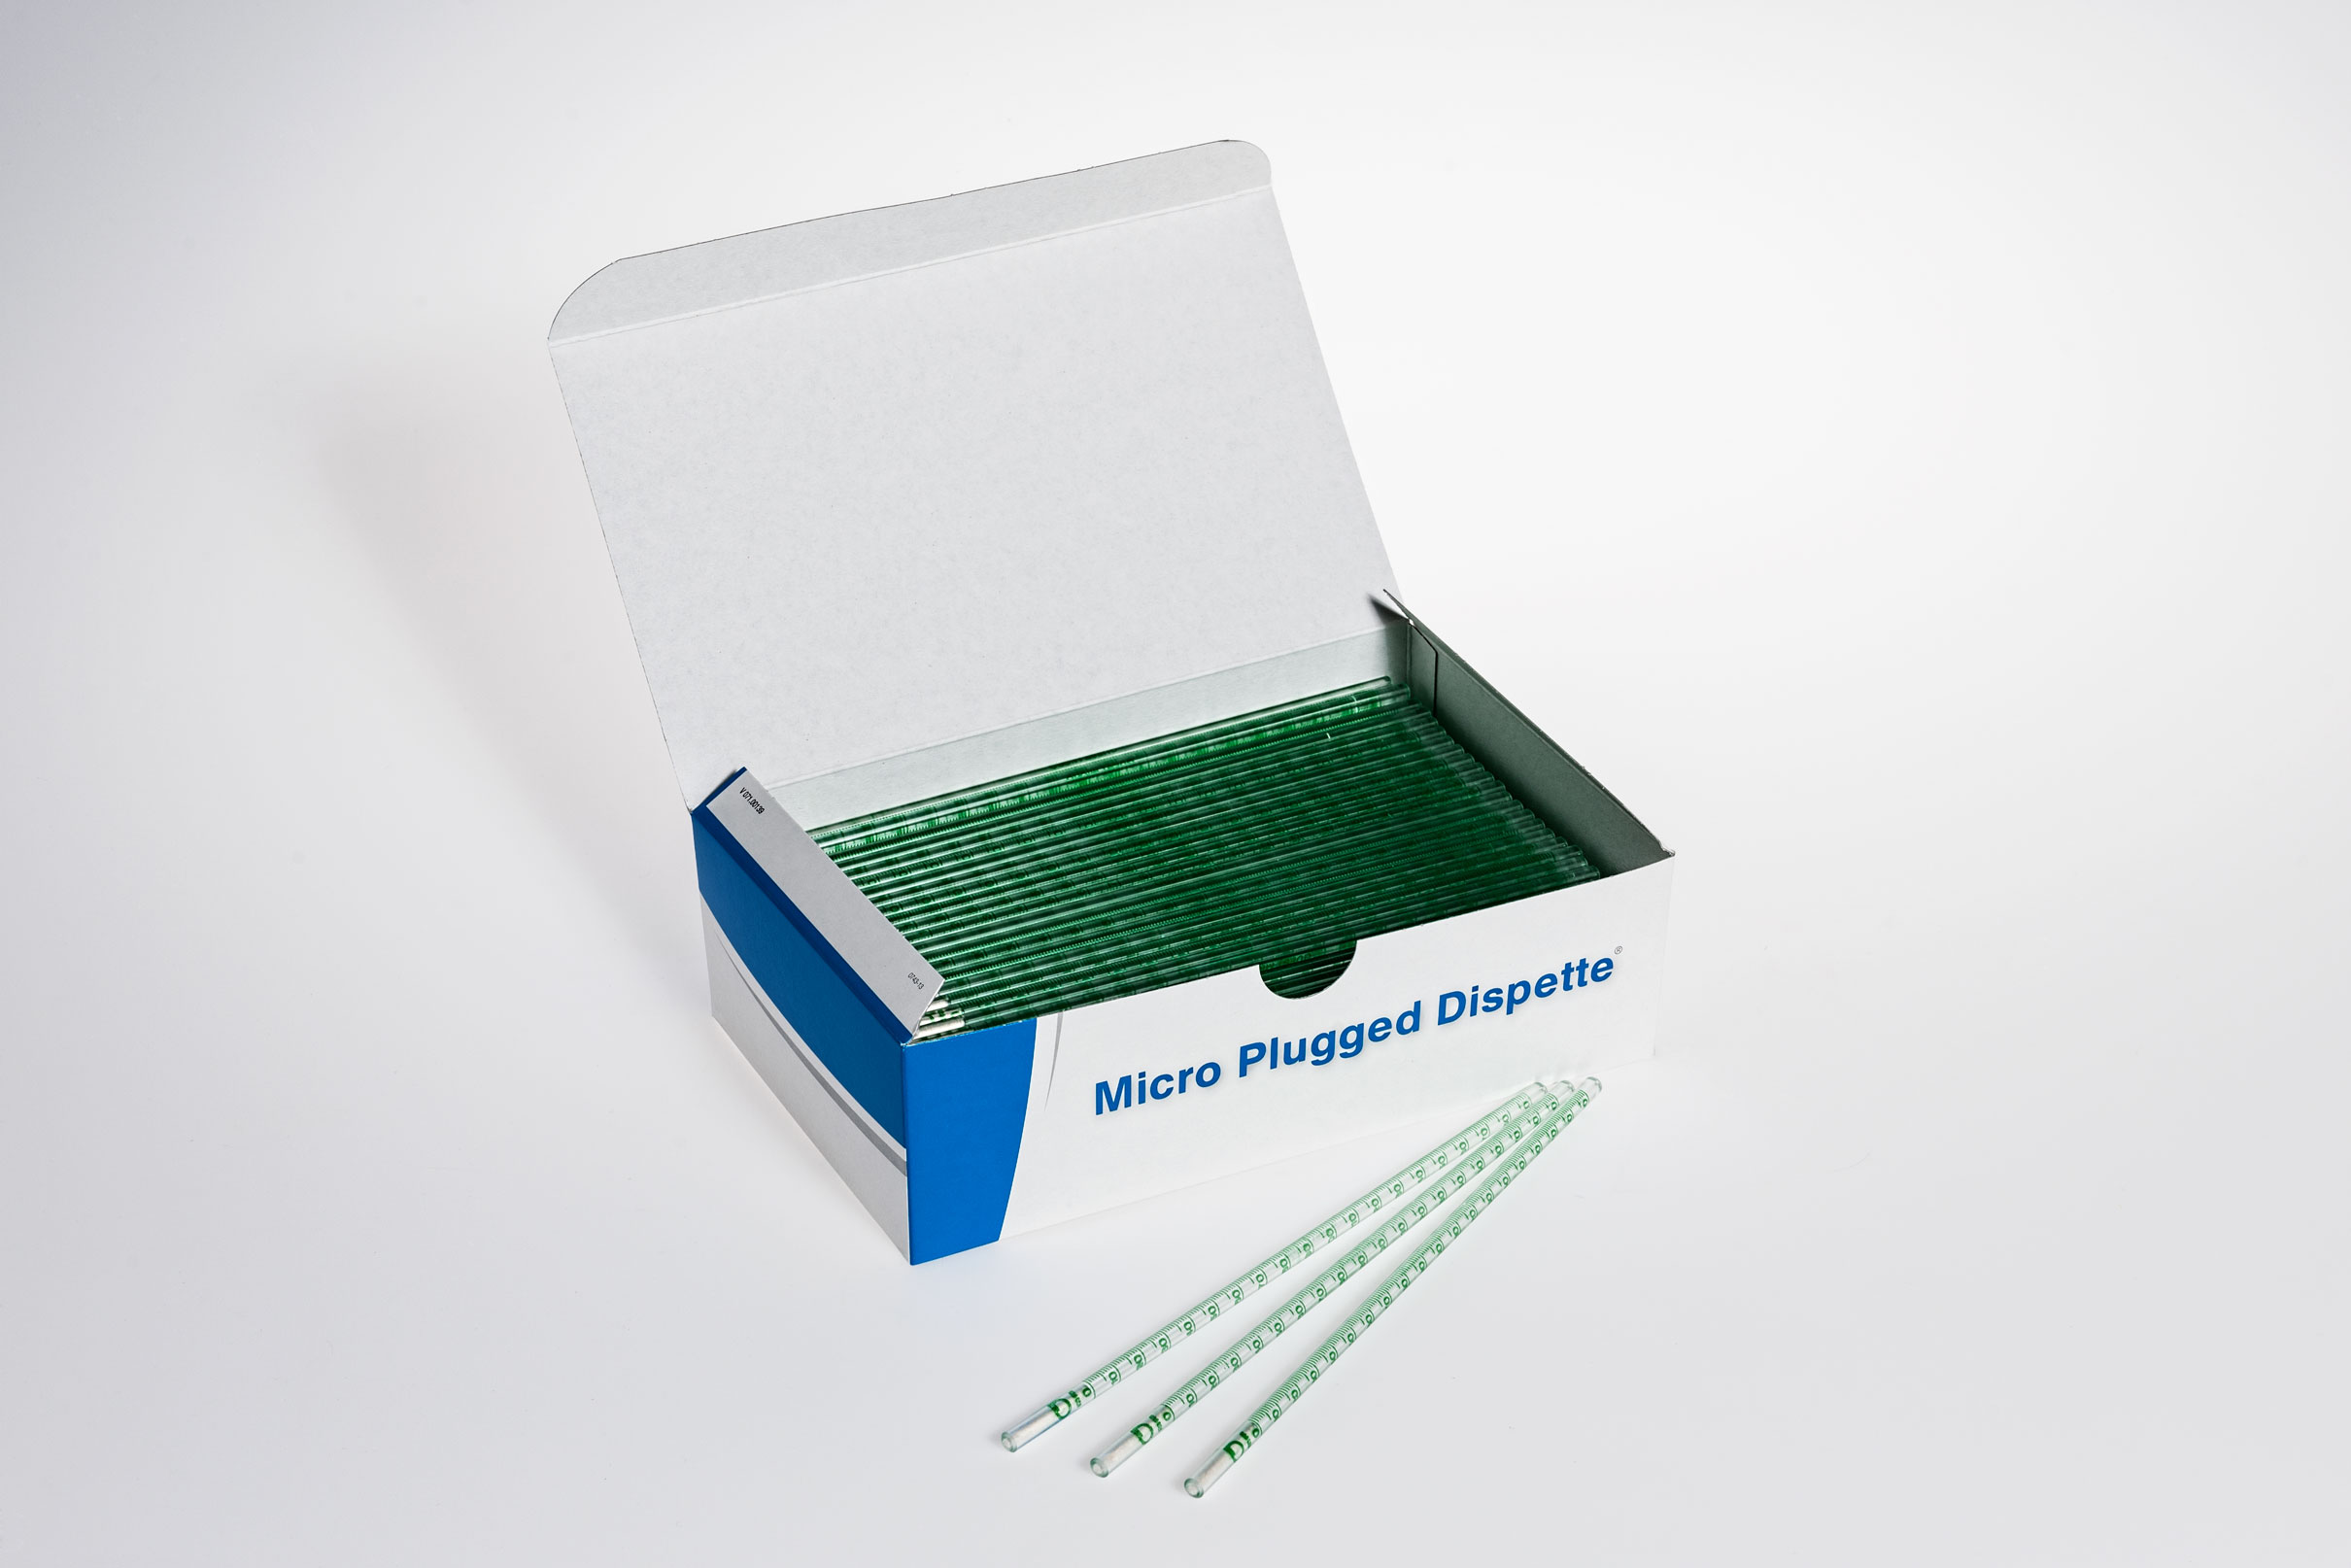 Micro Plugged Dispette FH-1530M